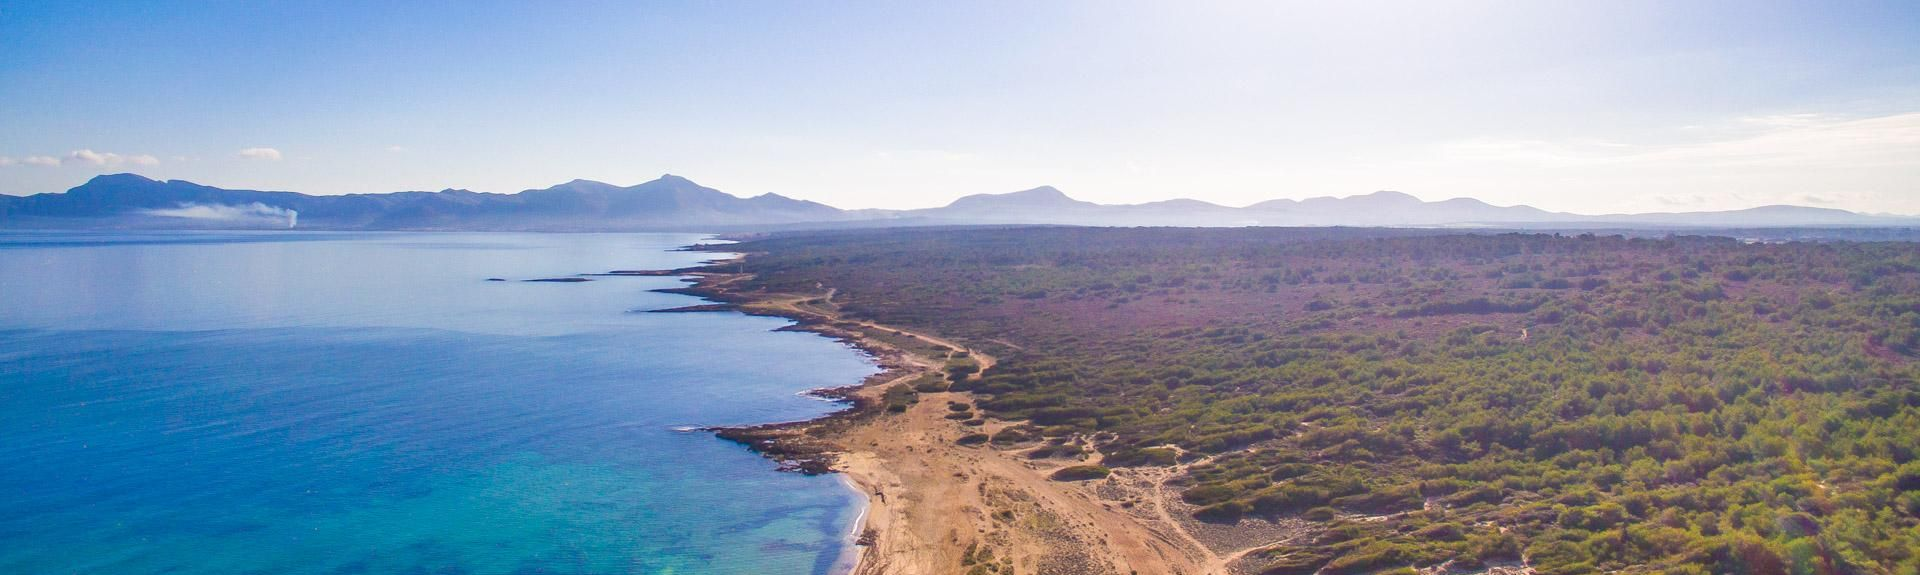 Sant Joan, Balearic Islands, Spain